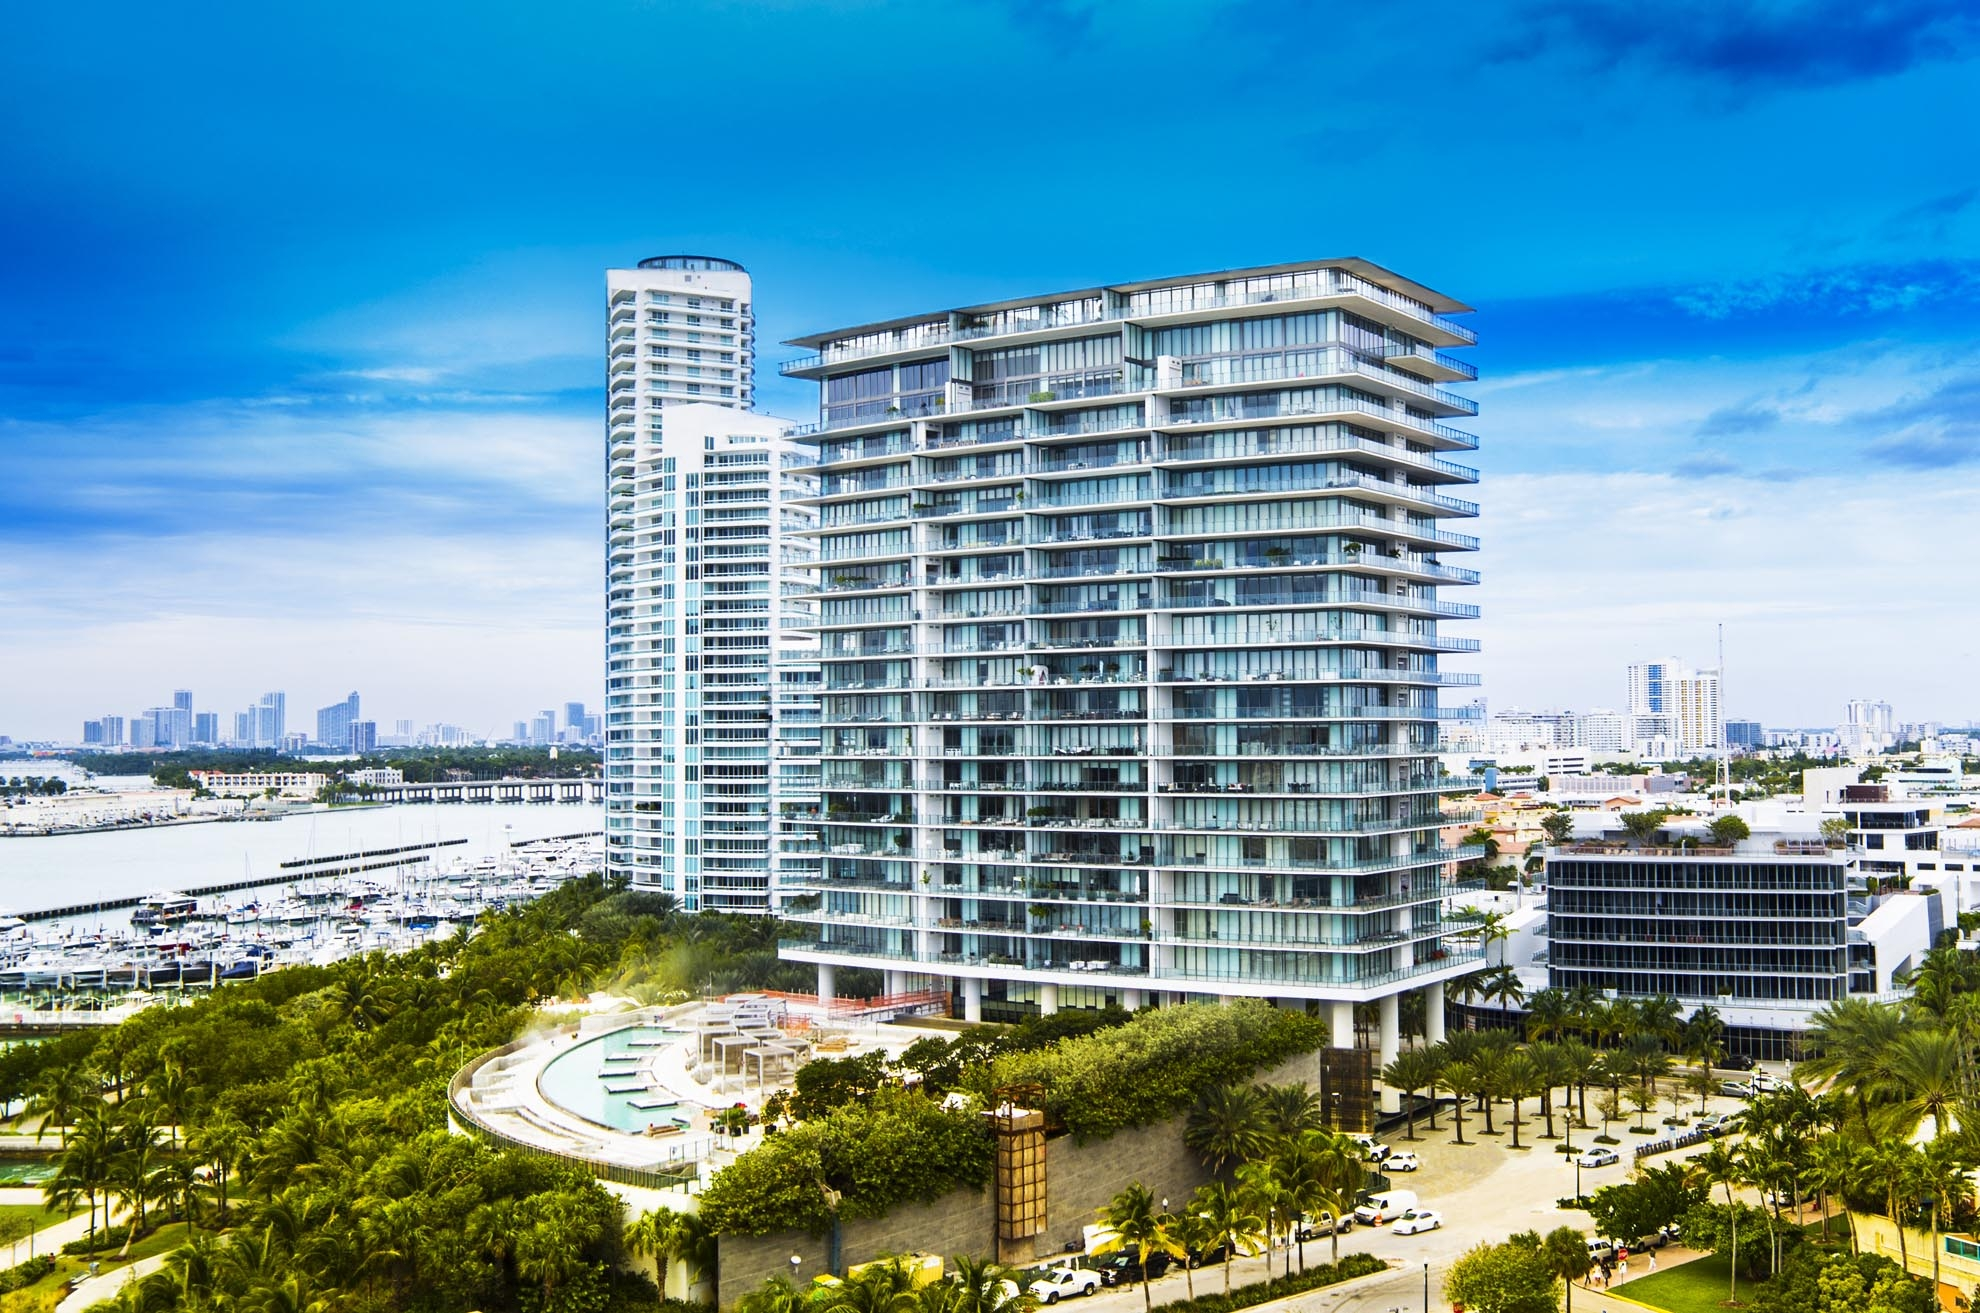 Drone photograph of Apogee Condominiums Miami Beach FL